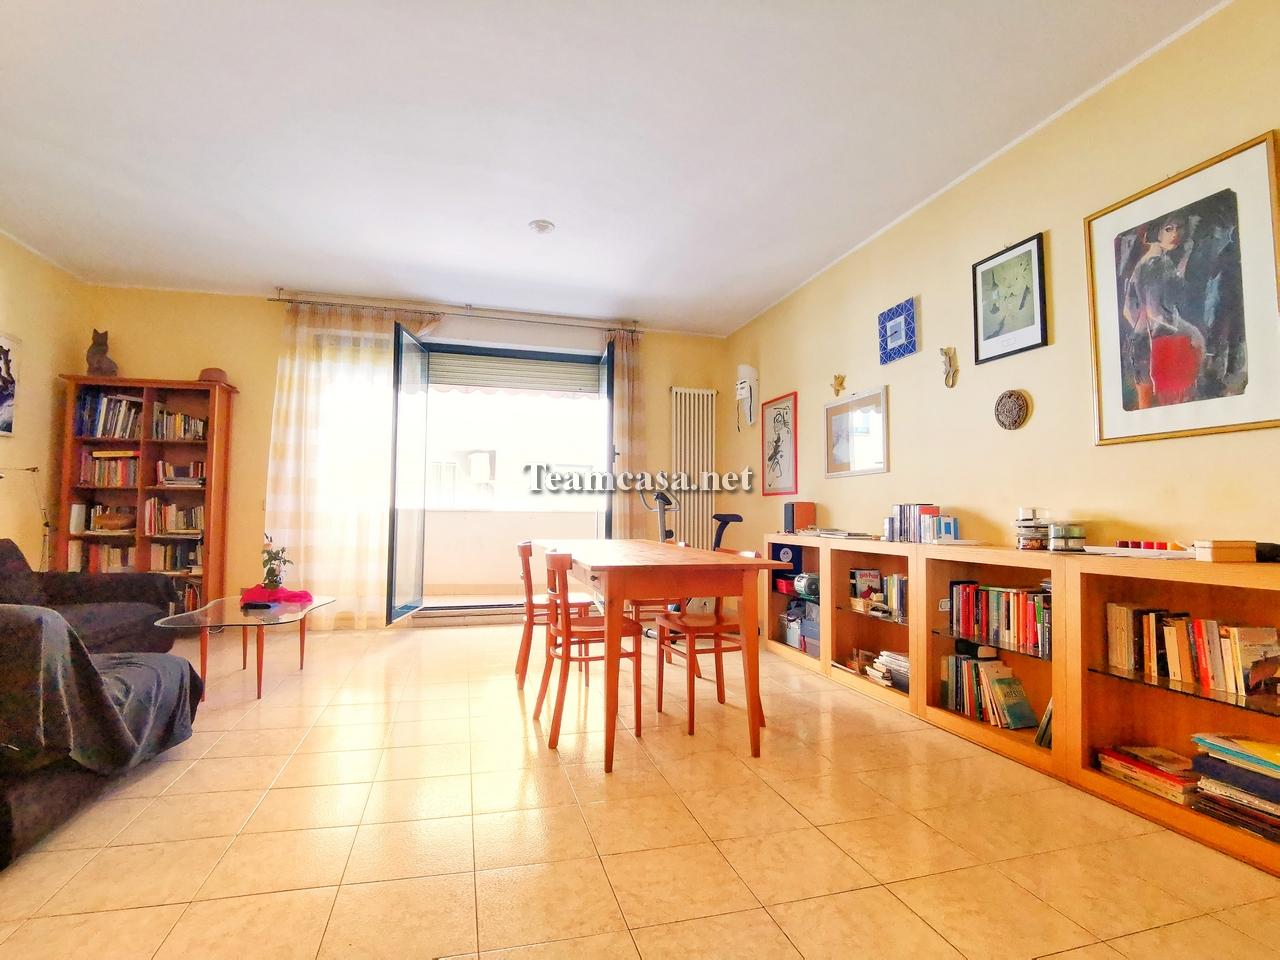 Appartamento, PIAZZALE GARIBALDI, Vendita - Pesaro (Pesaro Urbino)